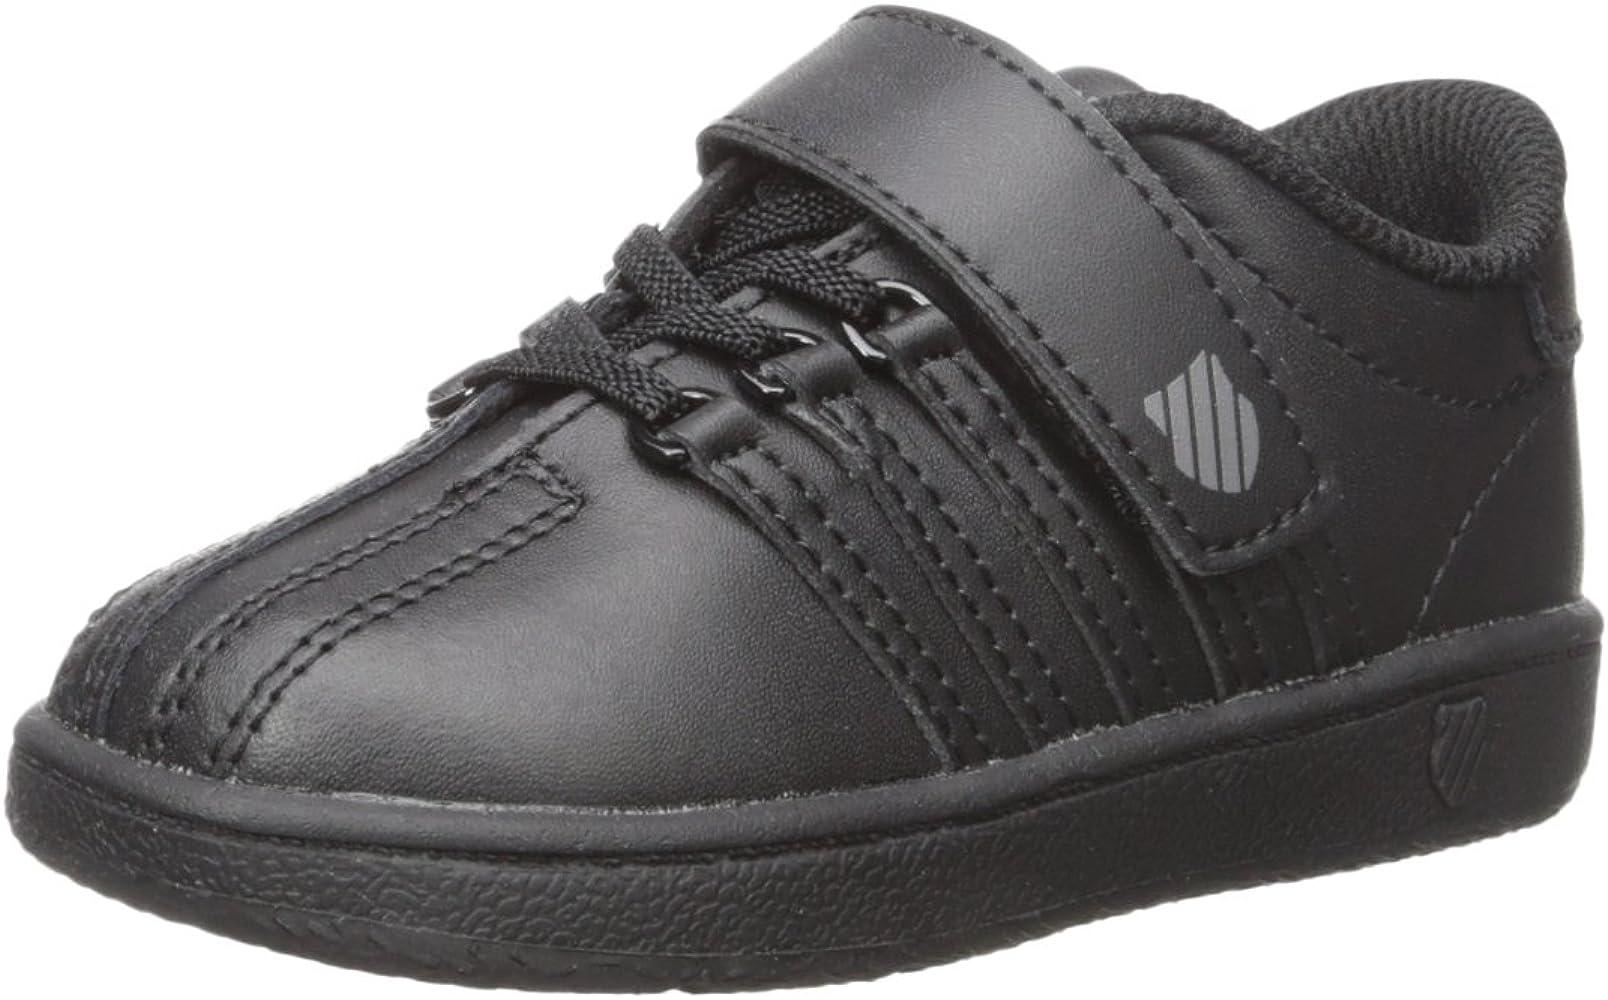 Amazon.com: K-Swiss Classic VN VLC Shoe